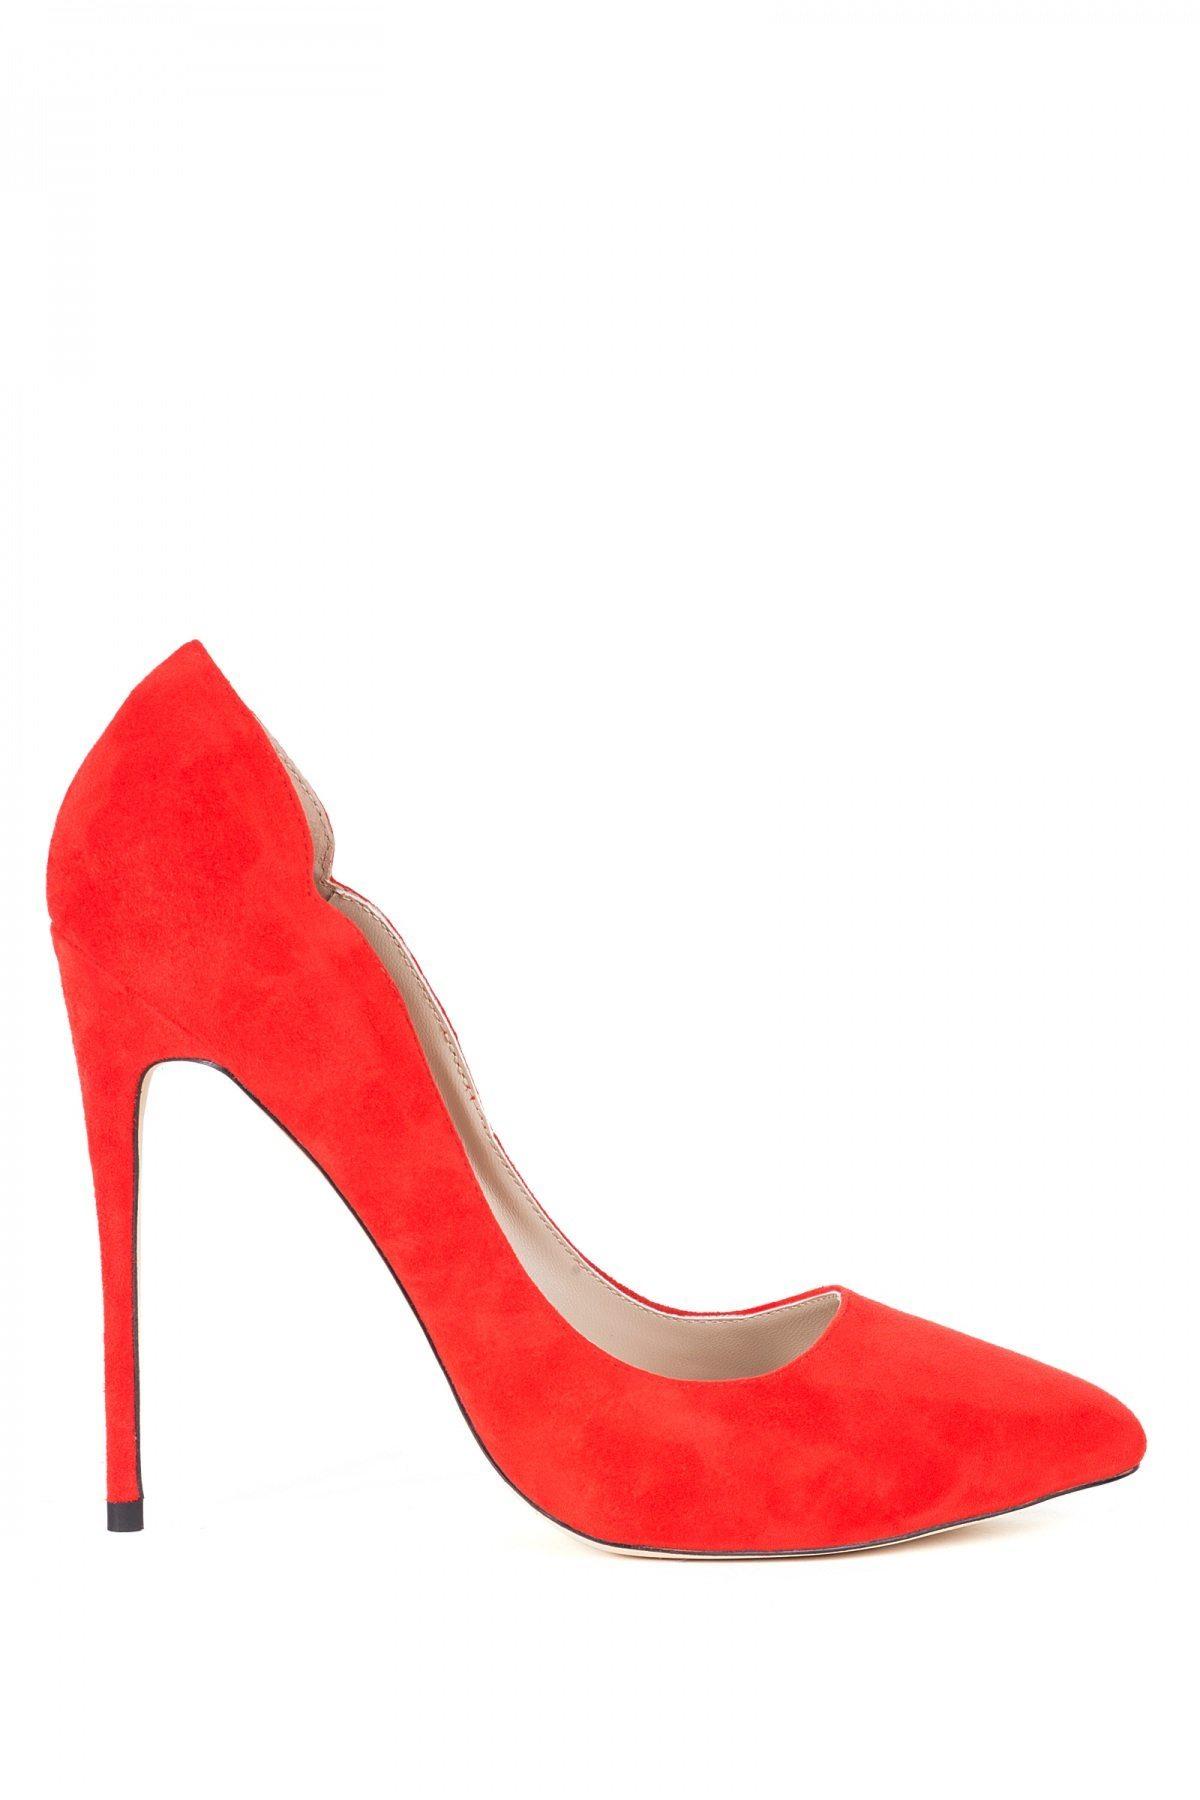 Pantofii stiletto din piele naturala Rosu